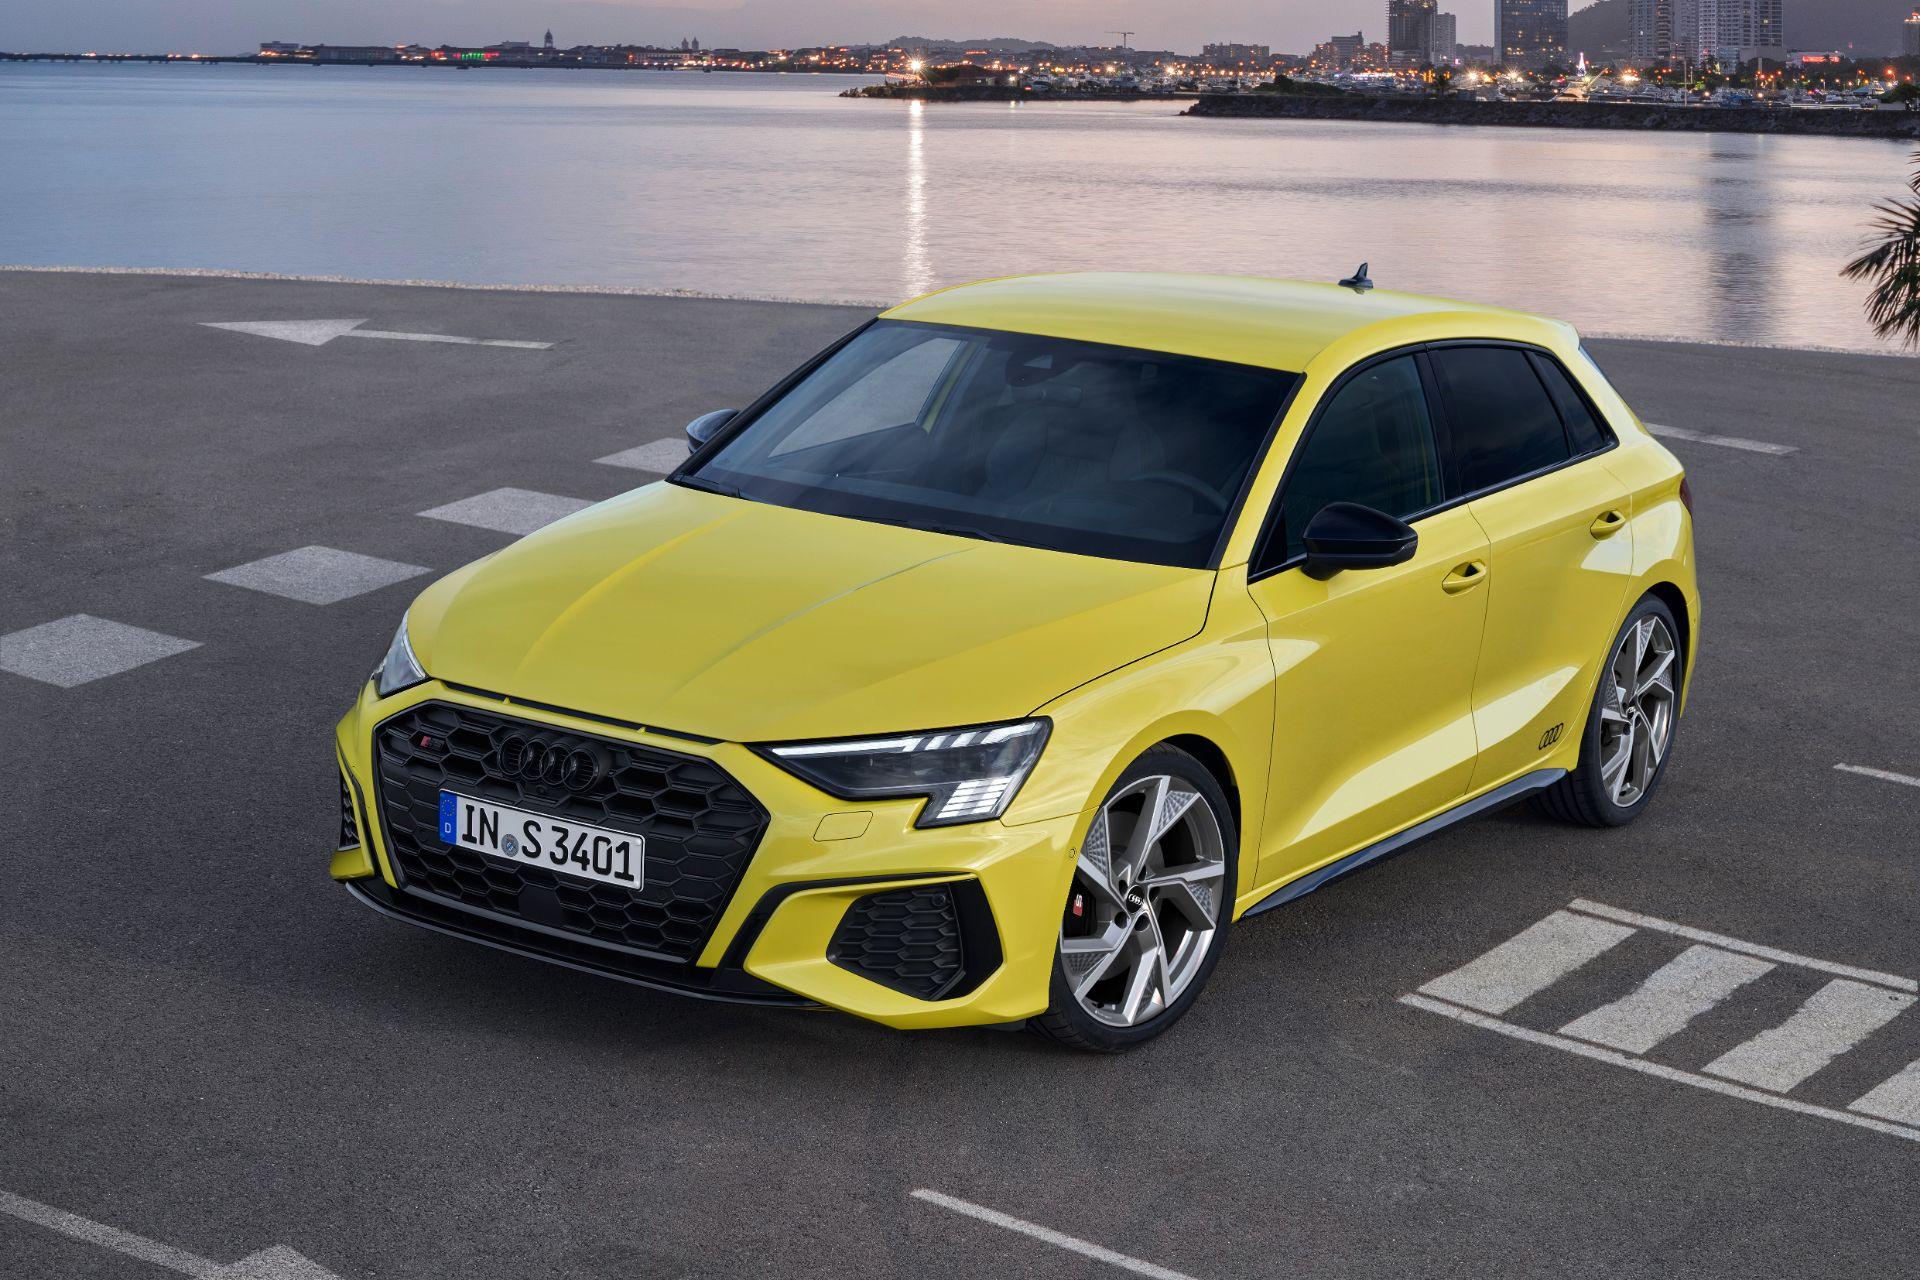 2021 Audi A3 Sportback (Photos, price, performance and ...